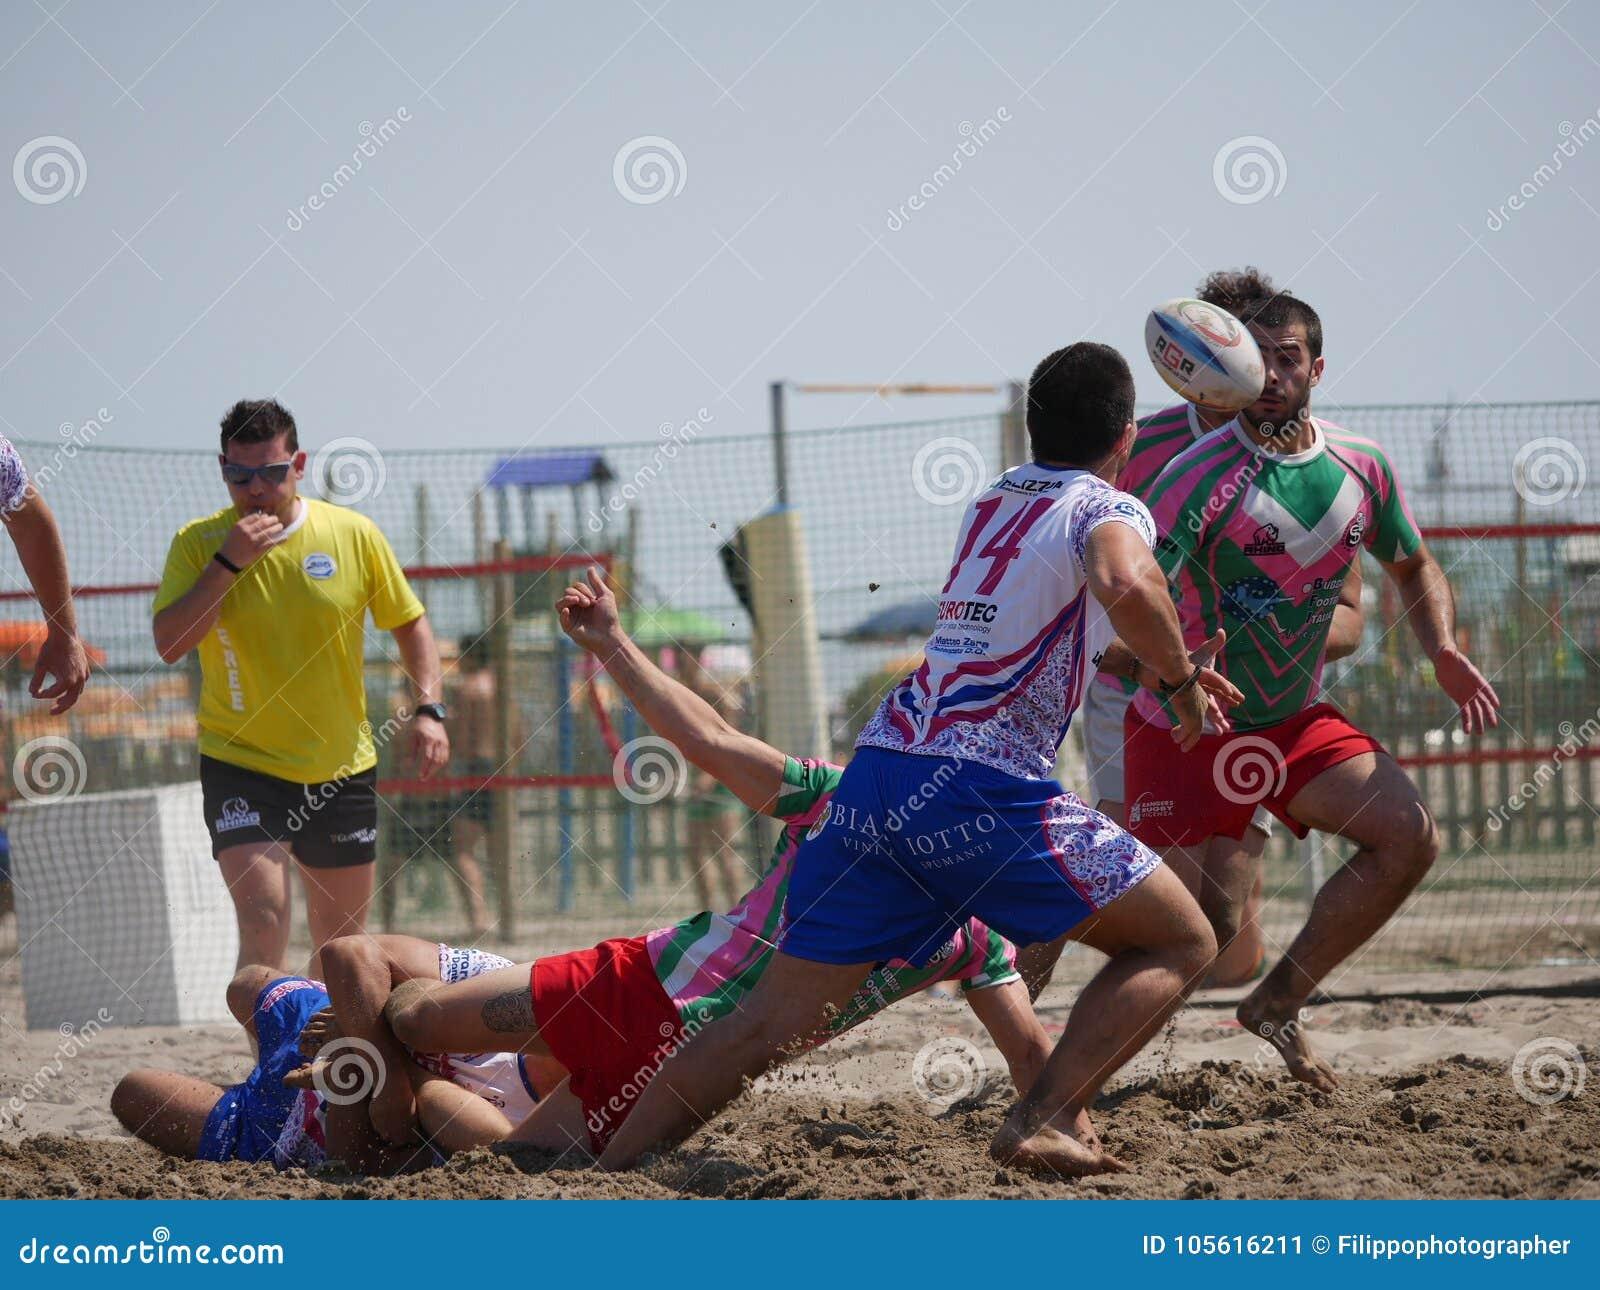 Beach rugby rosolina strani tipi vs beach busters